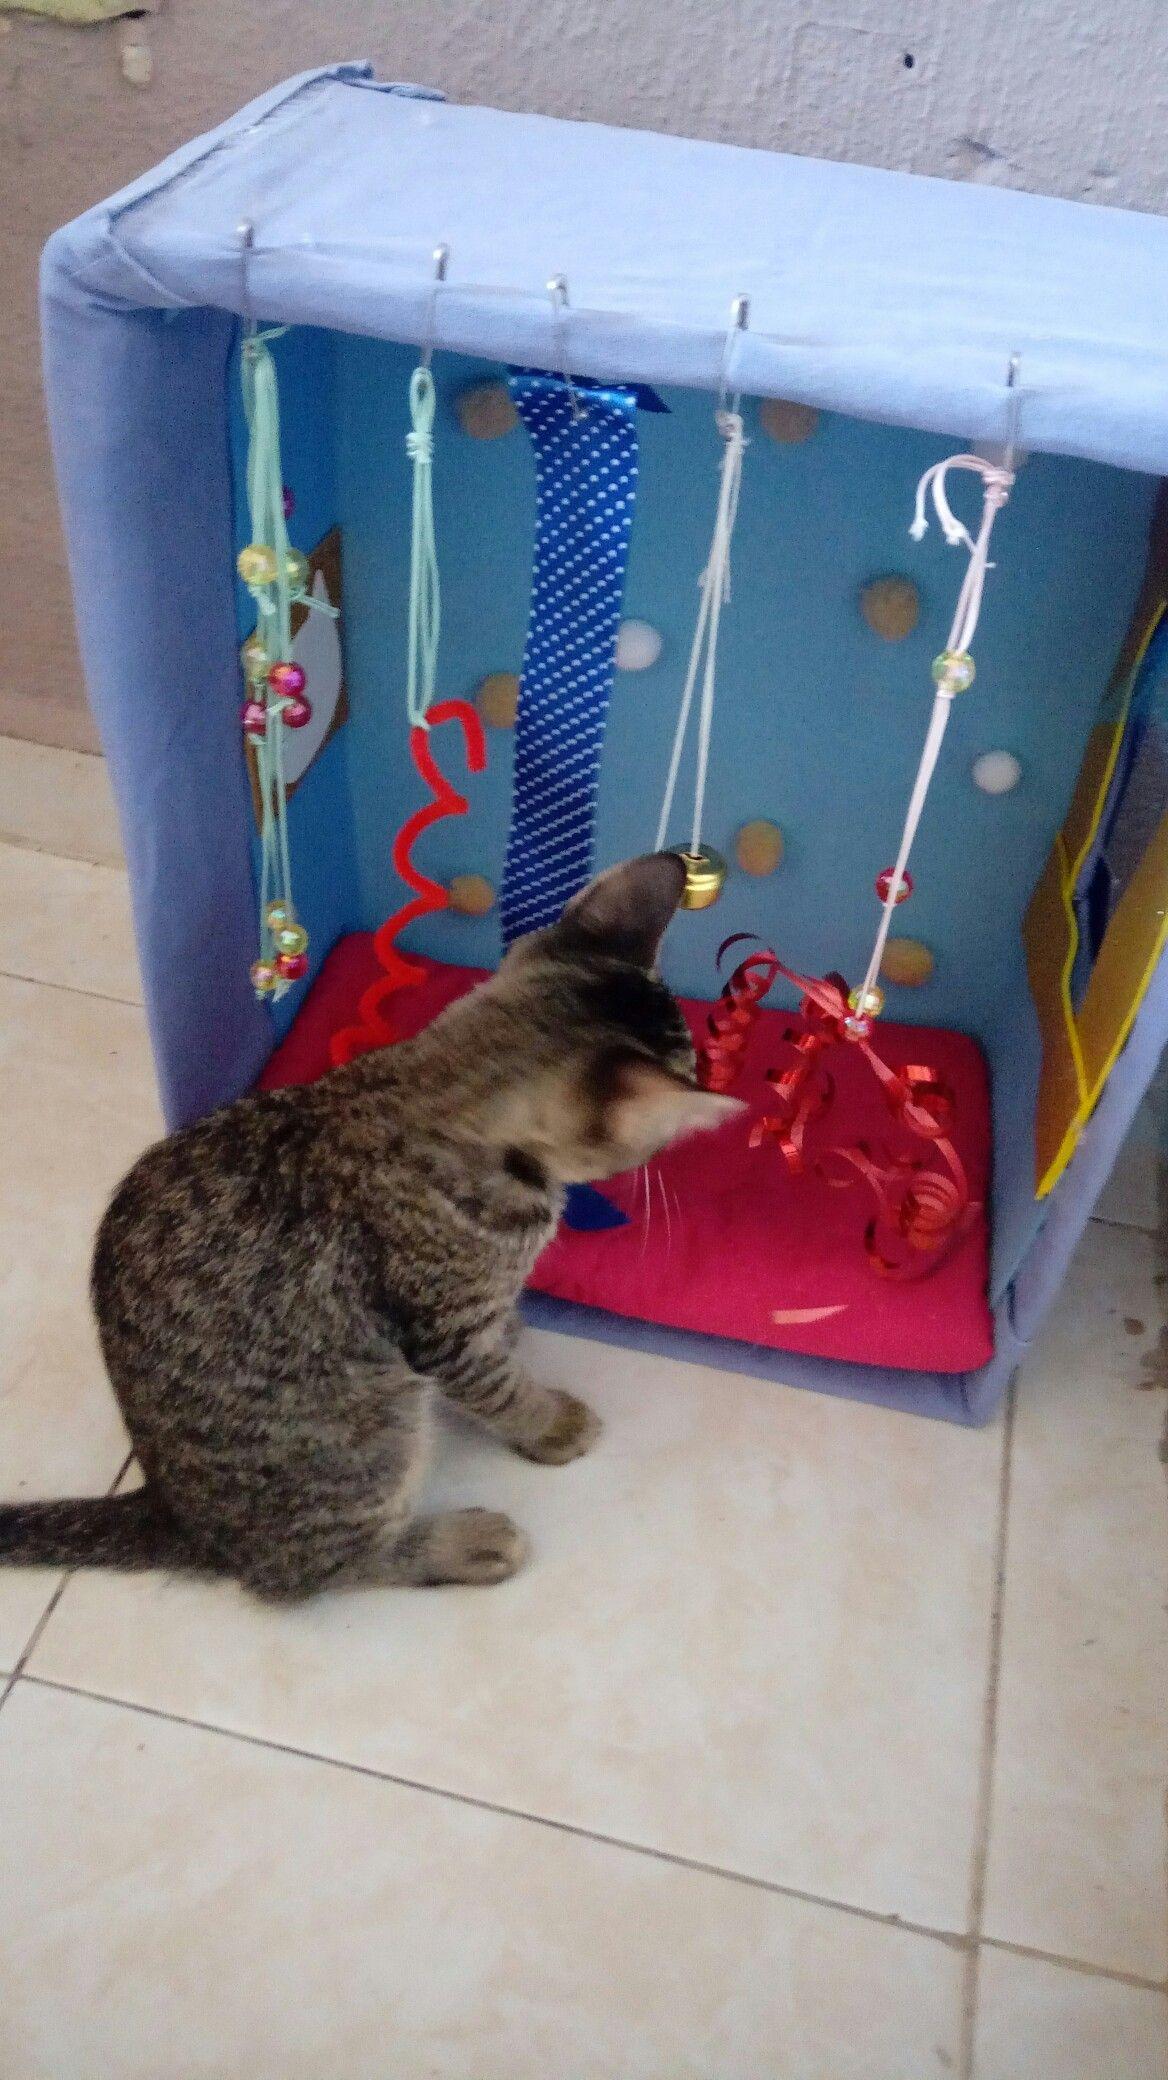 Pin By Azu Noe On Dlya Kota In 2020 Homemade Cat Toys Diy Cat Toys Cats Diy Projects